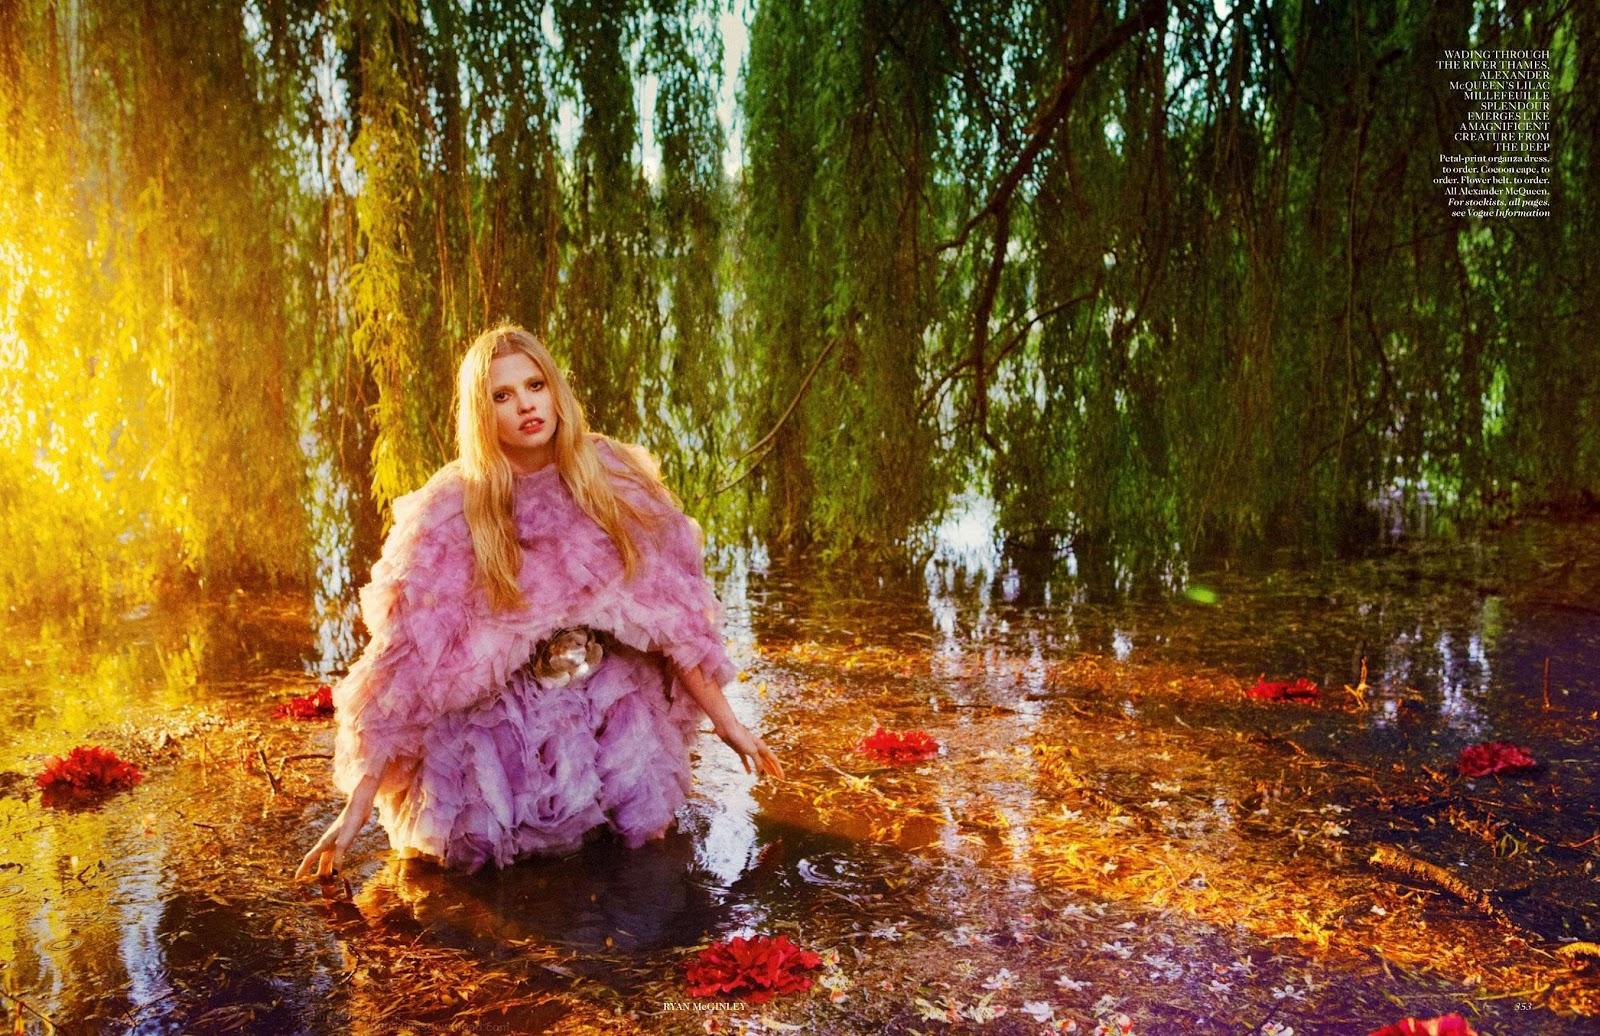 http://3.bp.blogspot.com/-ocRIB_U6j08/UCAz41iVlqI/AAAAAAAAVNk/O2RdsH6W8BM/s1600/Lara+Stone+-+Vogue+UK+September+2012+2.jpg